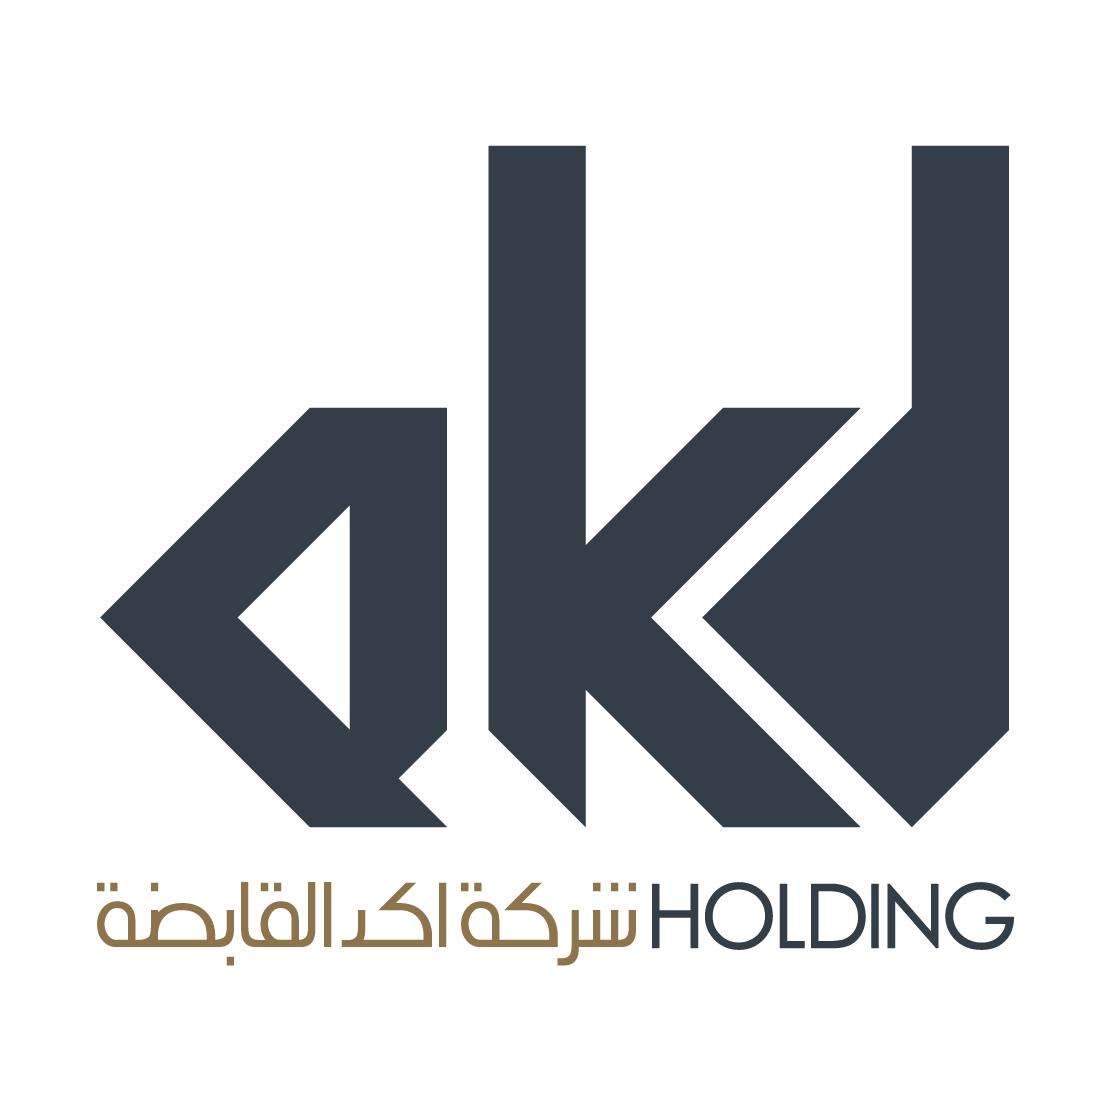 logos-47.jpg